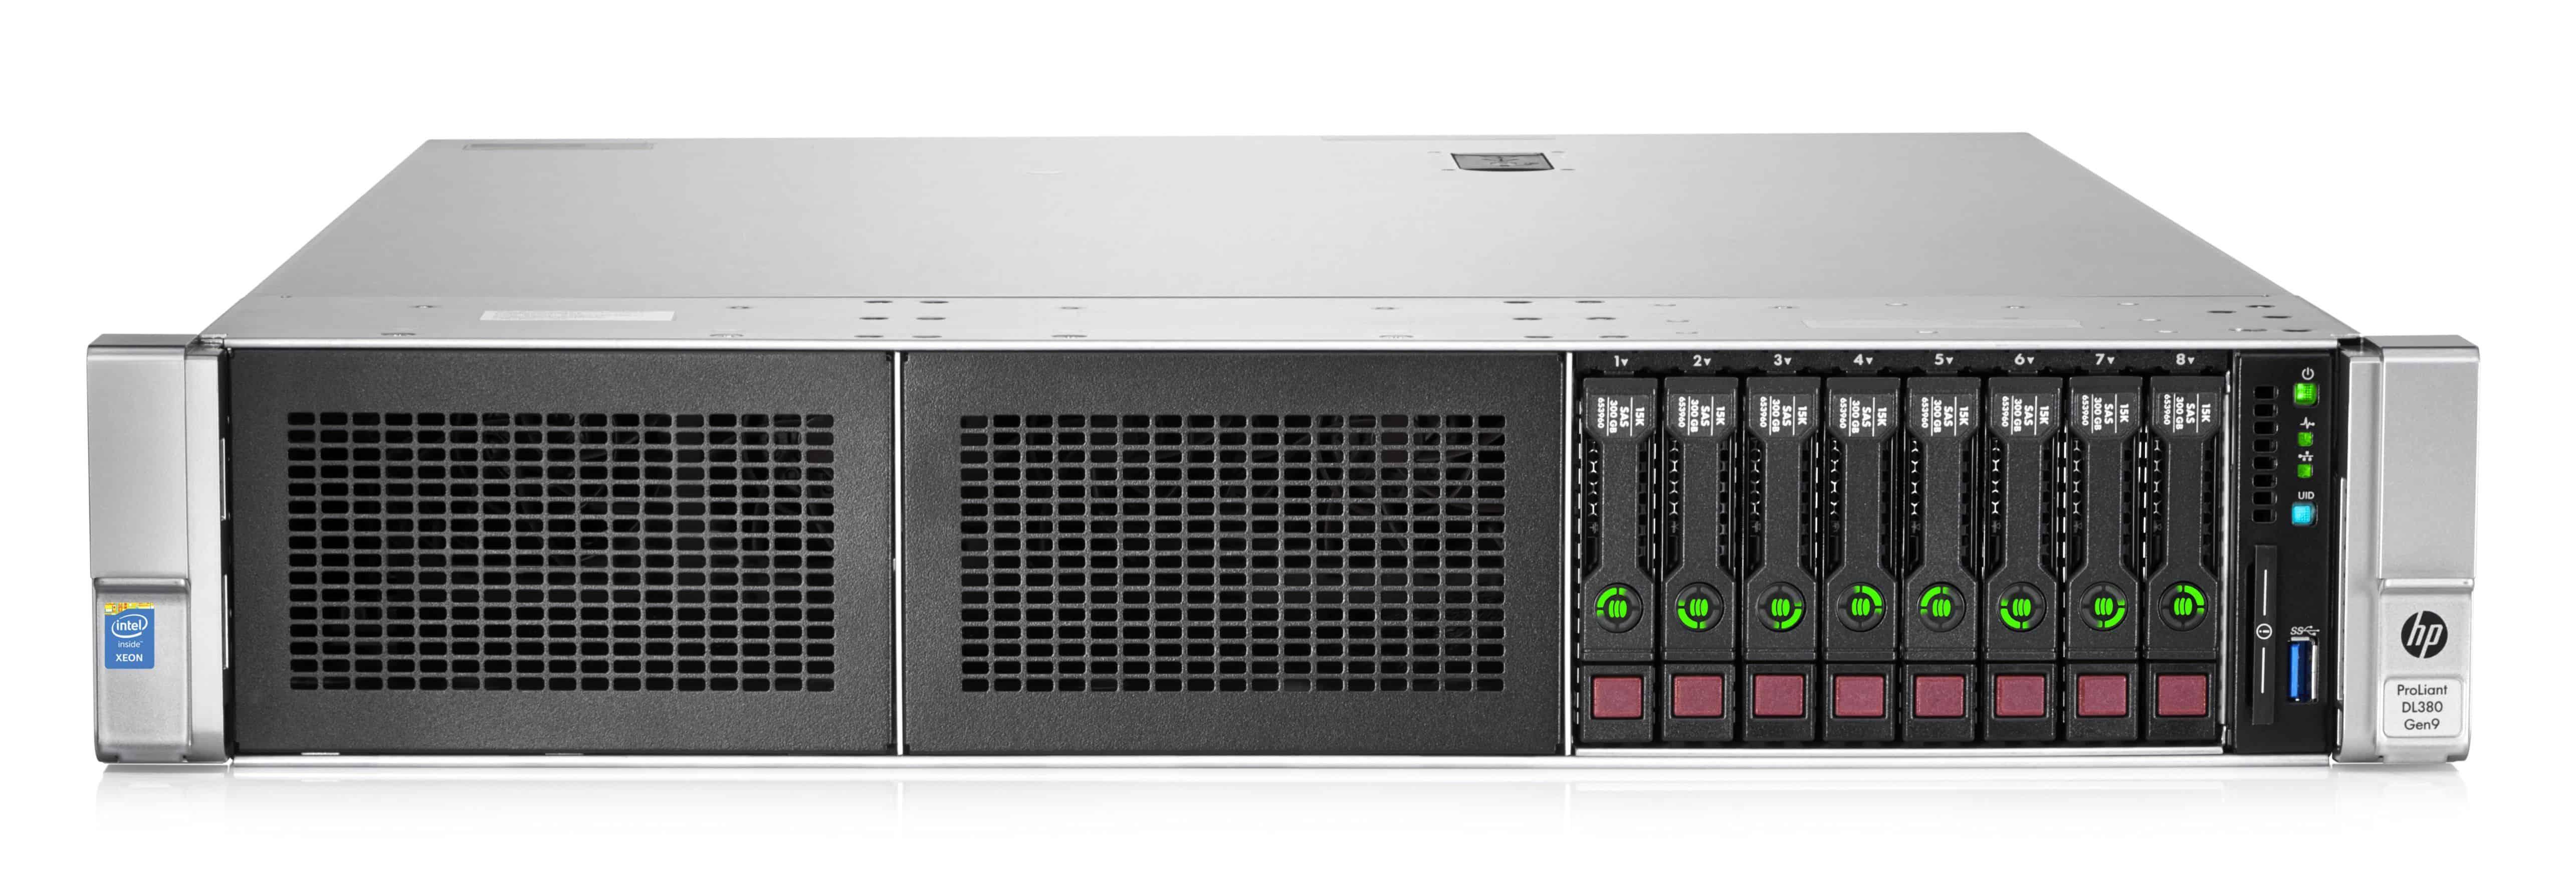 Biareview com - HP Proliant DL380 Gen9